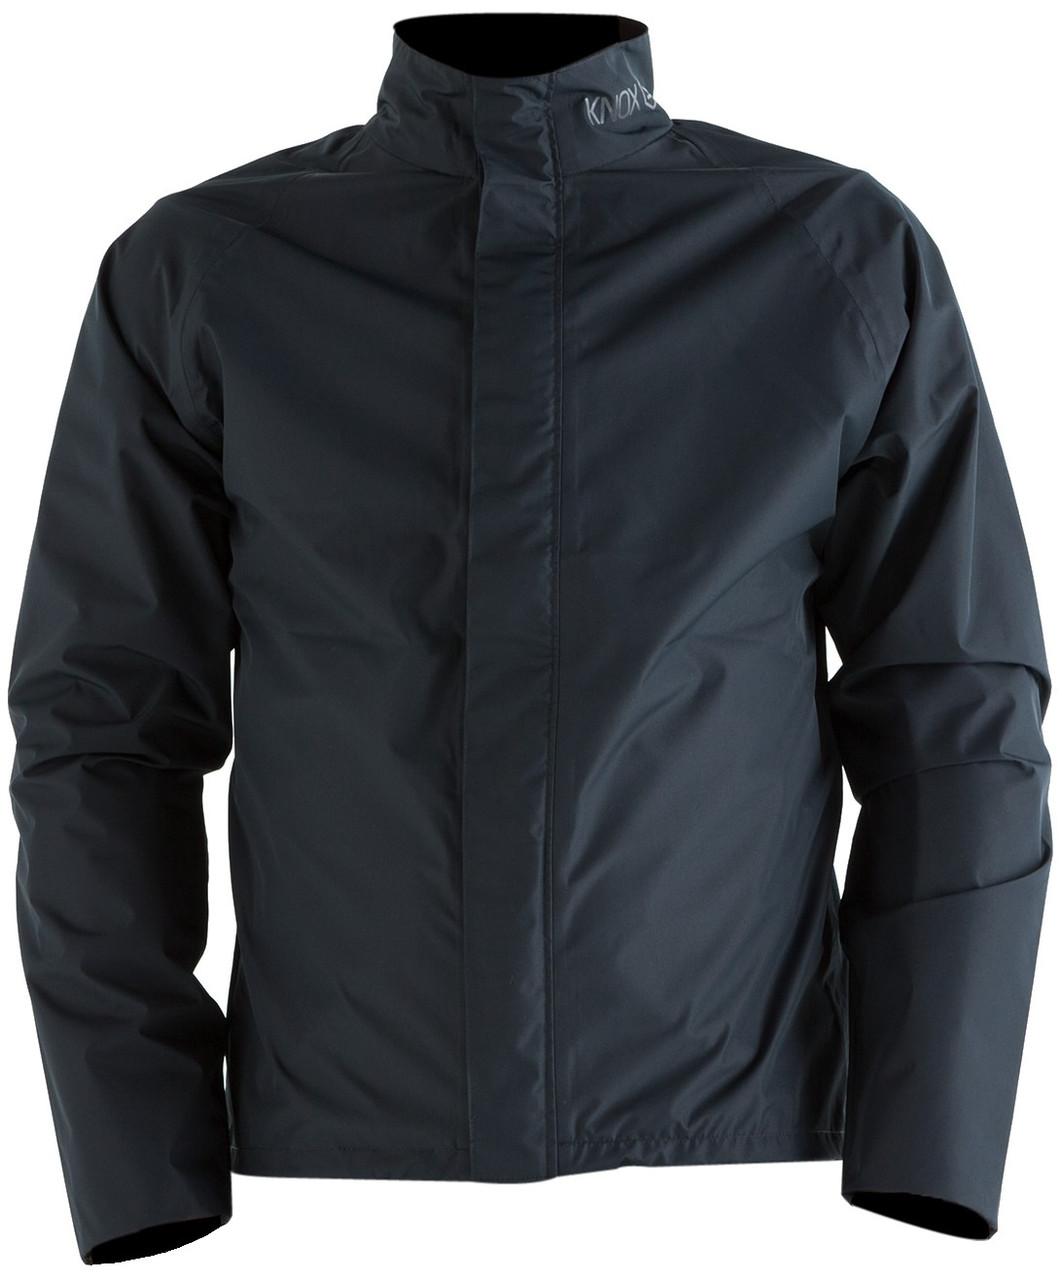 Дощовик куртка Knox Zephyr Waterproof чорний, S/M